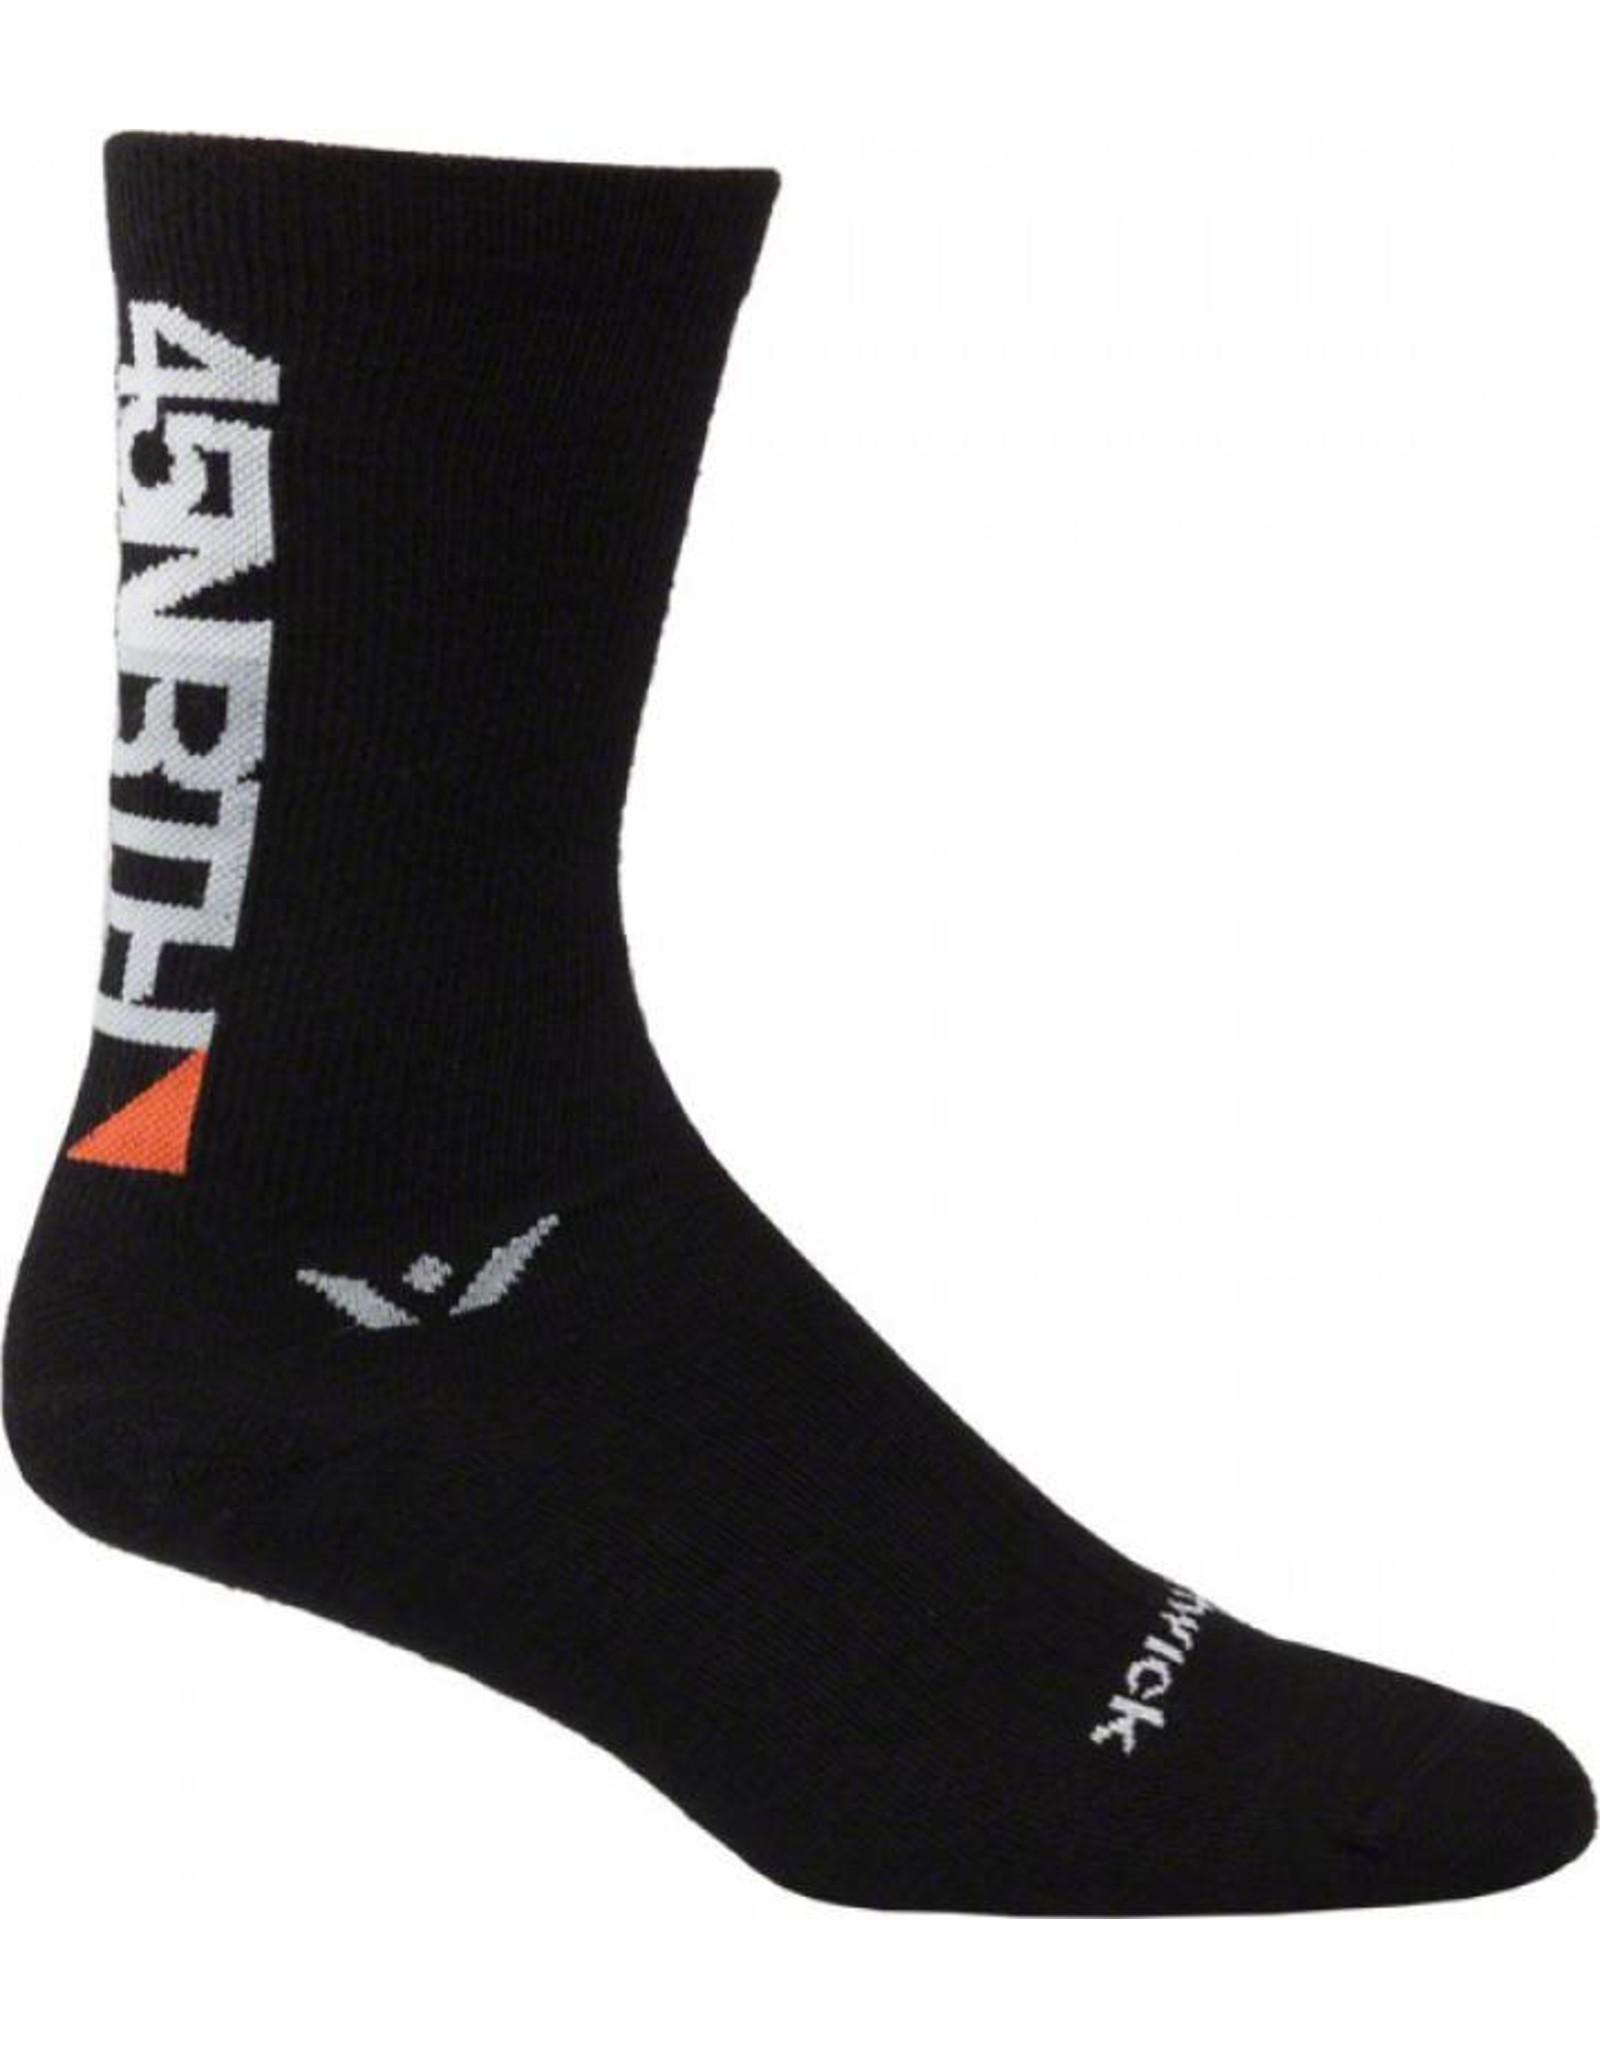 45NRTH 45NRTH Swiftwick Socks - Black - Large